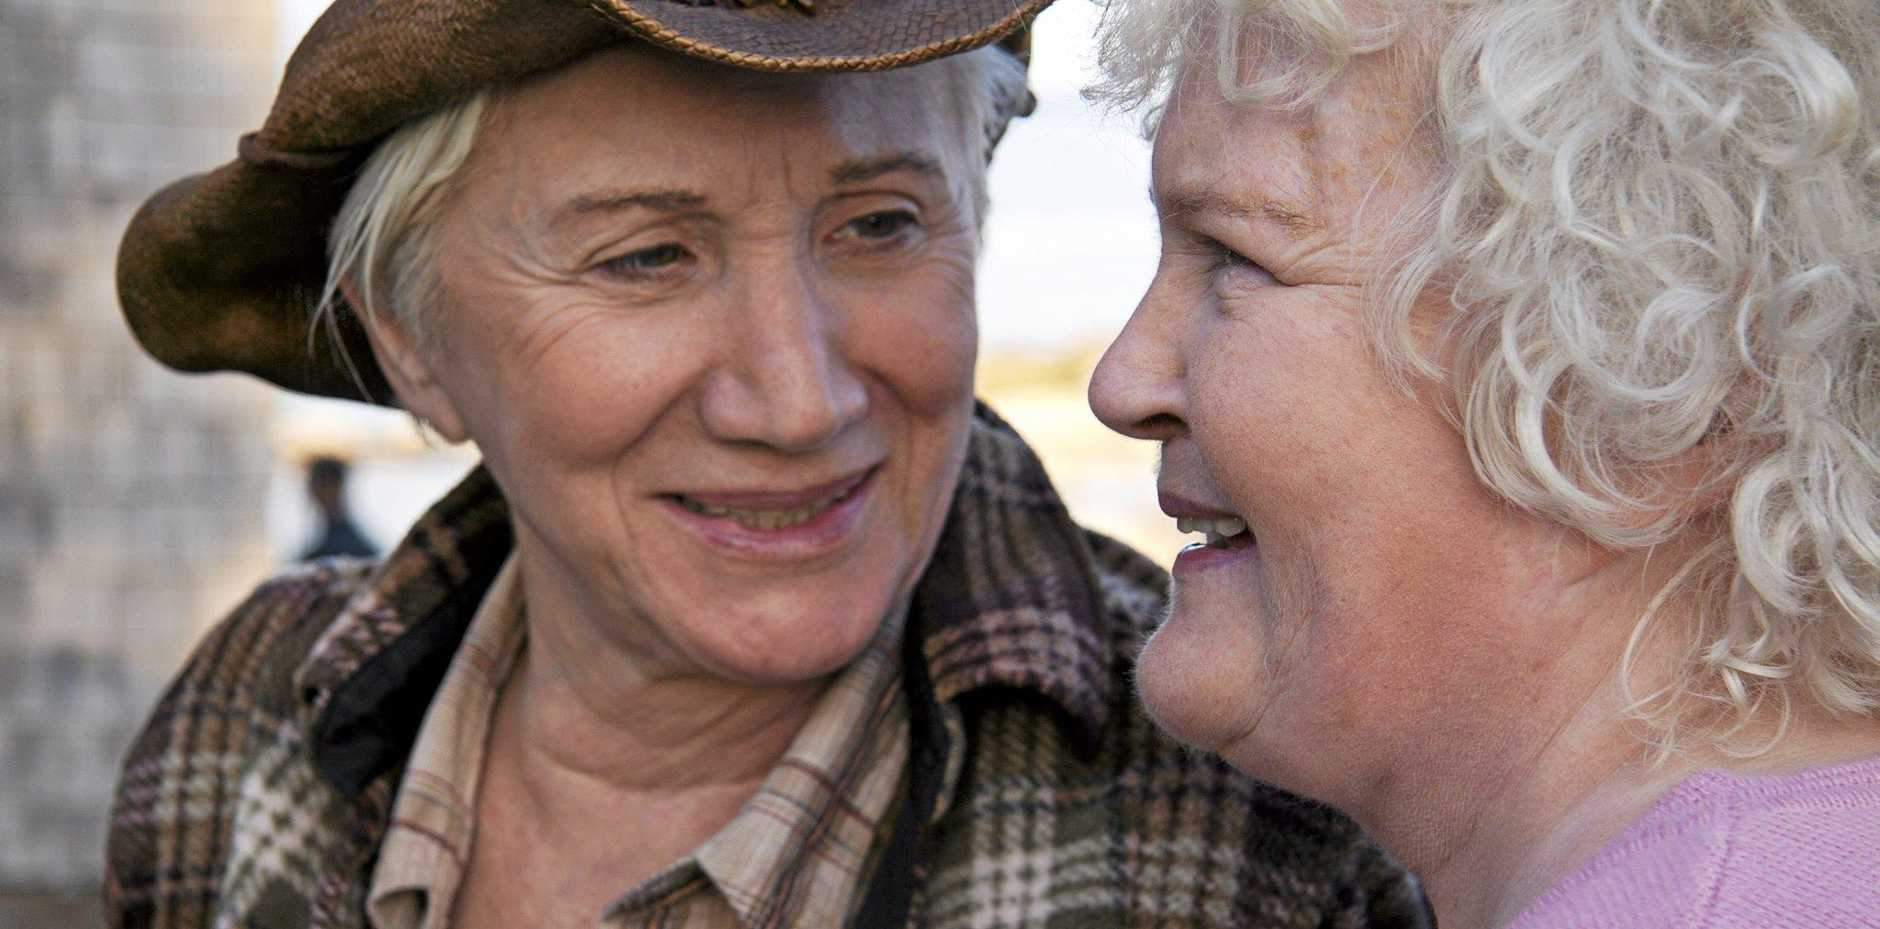 HEARTFELT: Academy Award winners Olympia Dukakis and Brenda Fricker will bring great heart and spirit to the Jetty Theatre next week in Cloudburst.